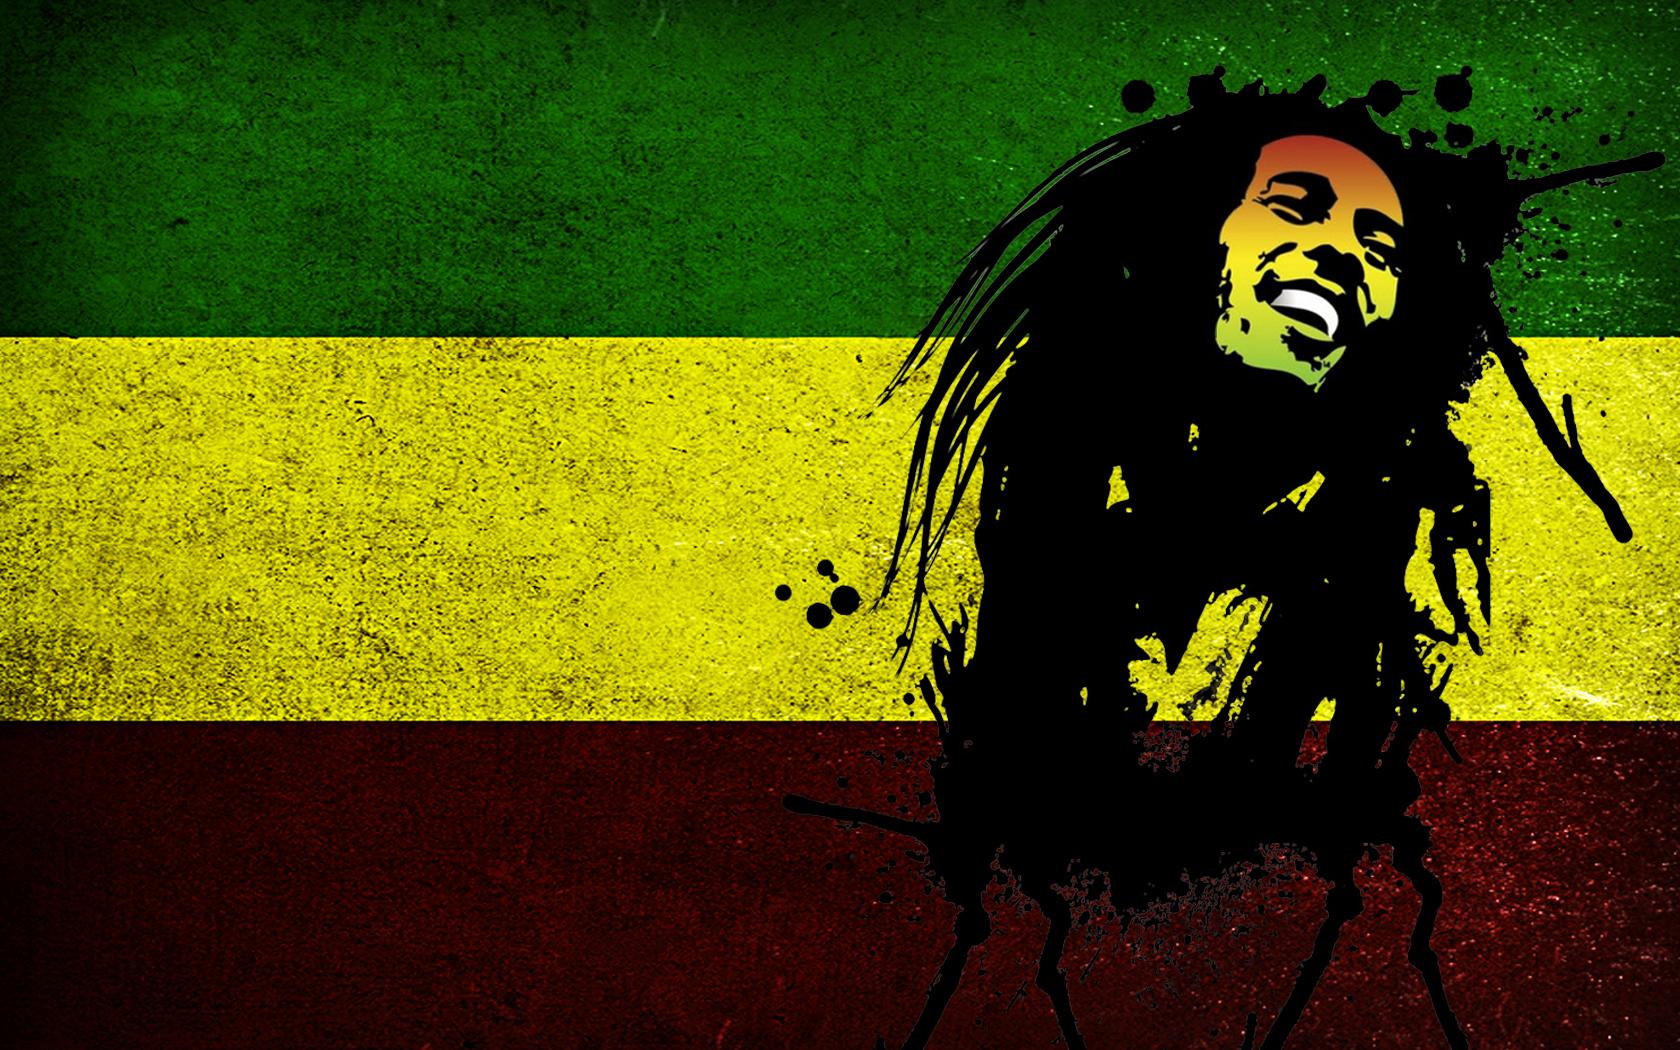 Bob Marley Reggae Music Wallpaper HD #11580 Wallpaper | WallpaperLepi